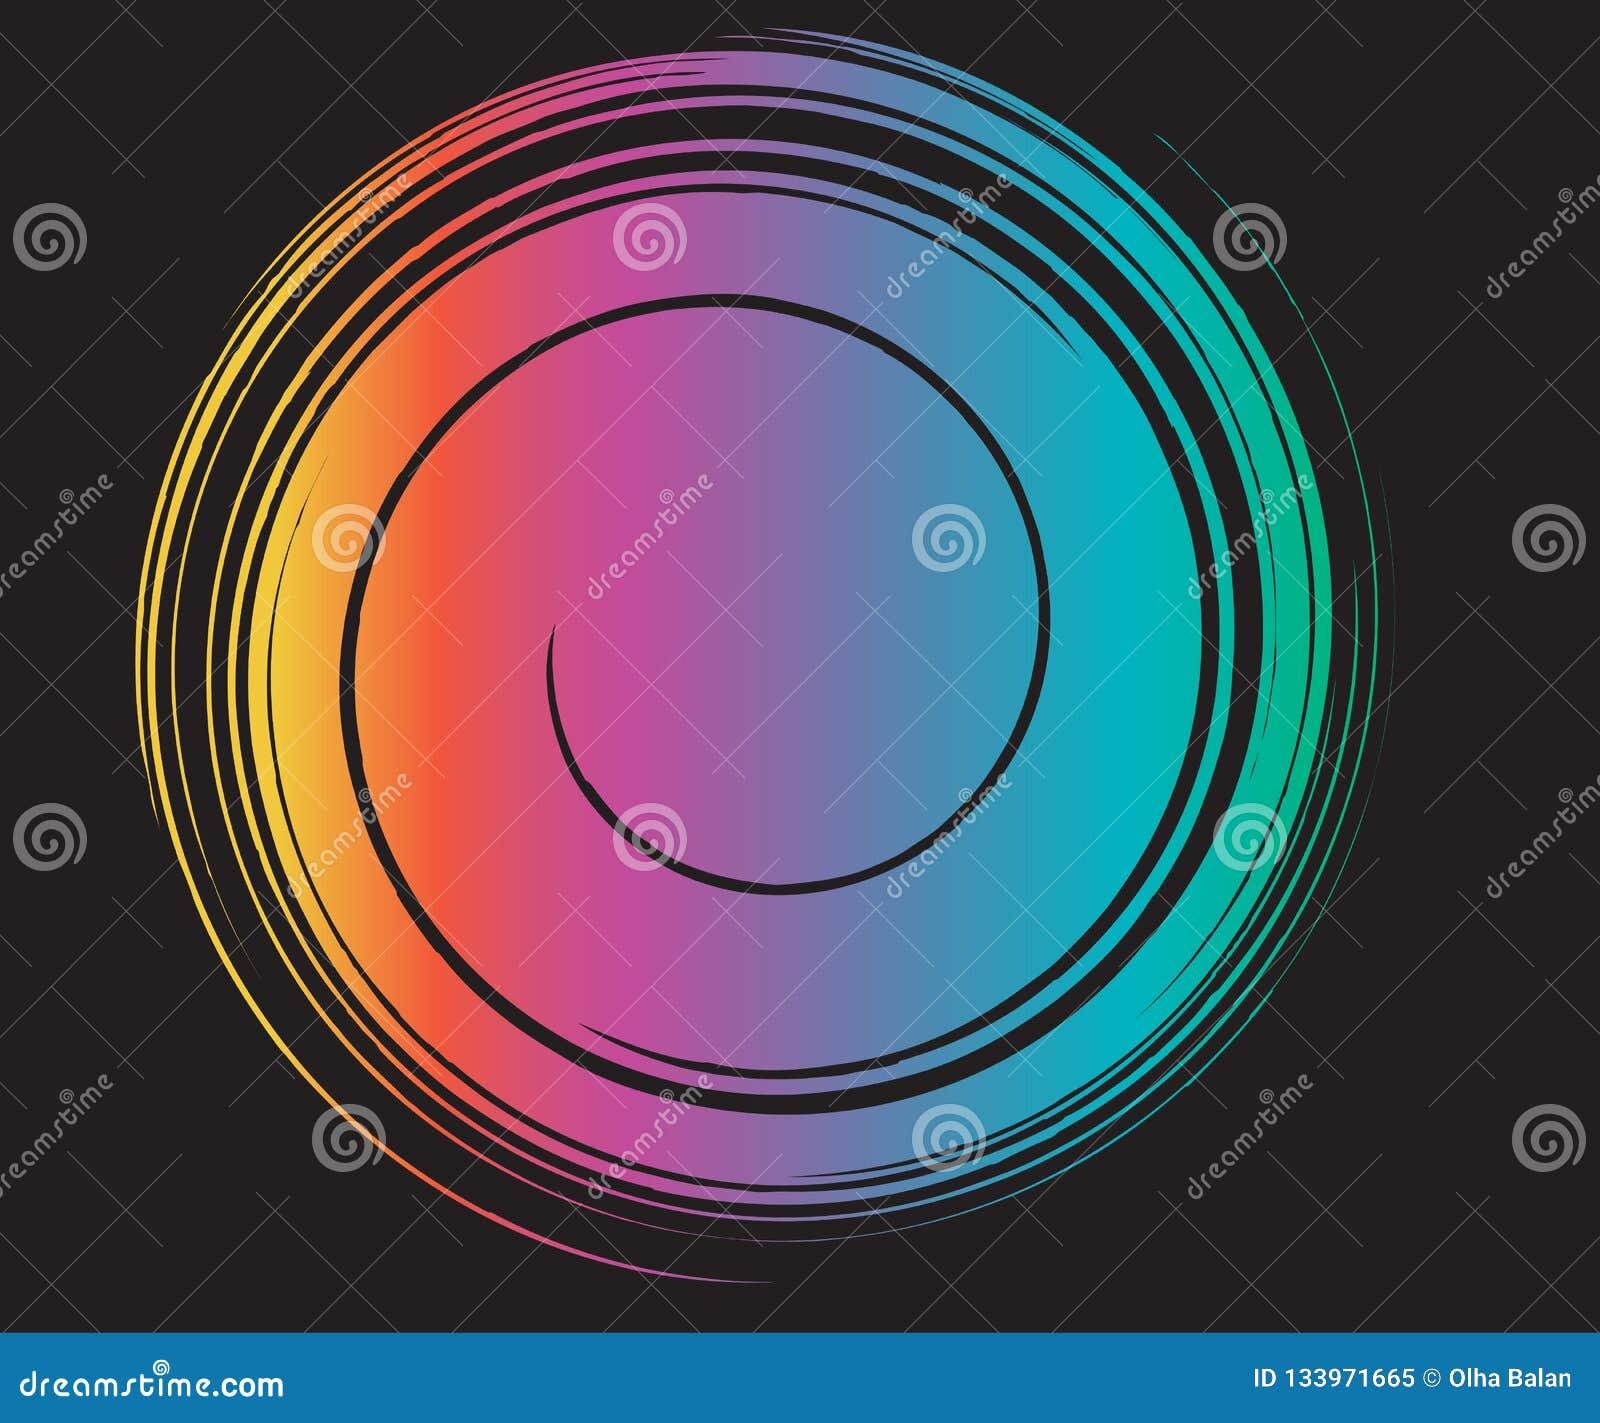 Fluid Rainbow Swirl Template